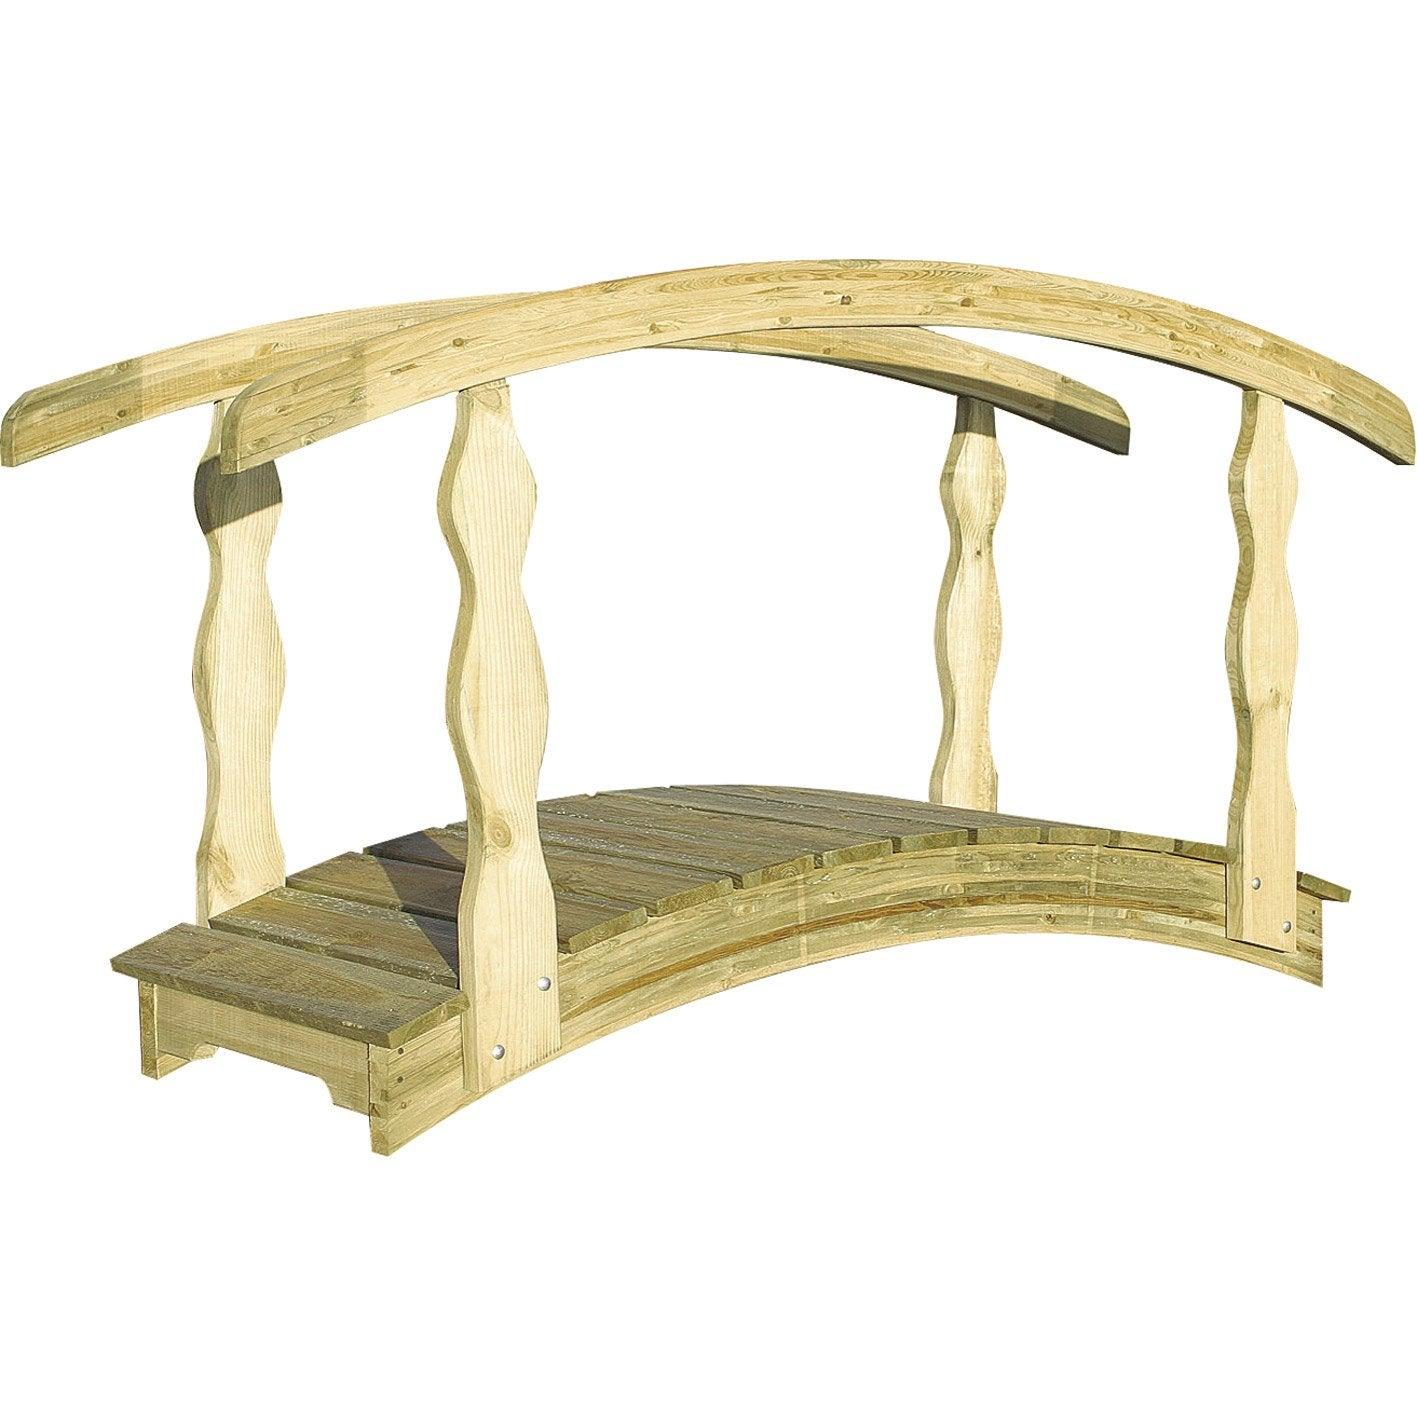 Pont en bois d coratif qu bec burger 180x110cm leroy merlin - Meubilair bassin leroy merlin ...